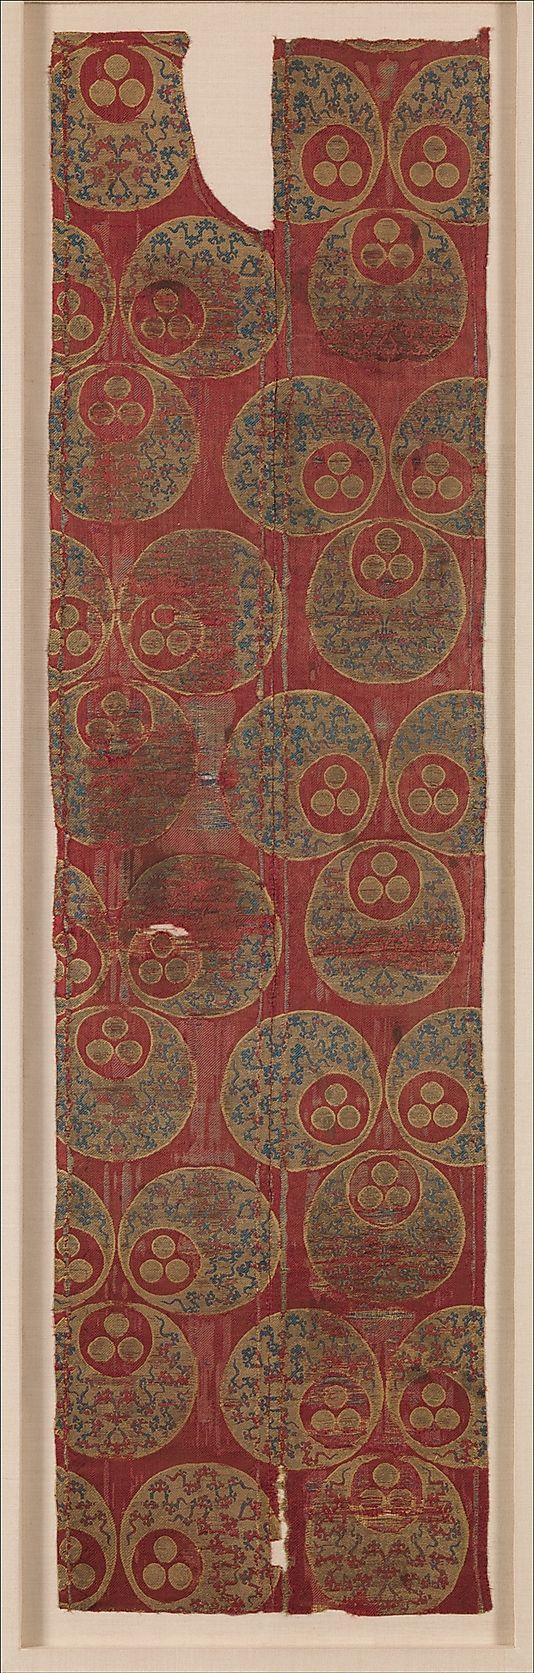 Ottoman 16th century silk textile with Large Chintamani Design. (Metropolitan Museum)